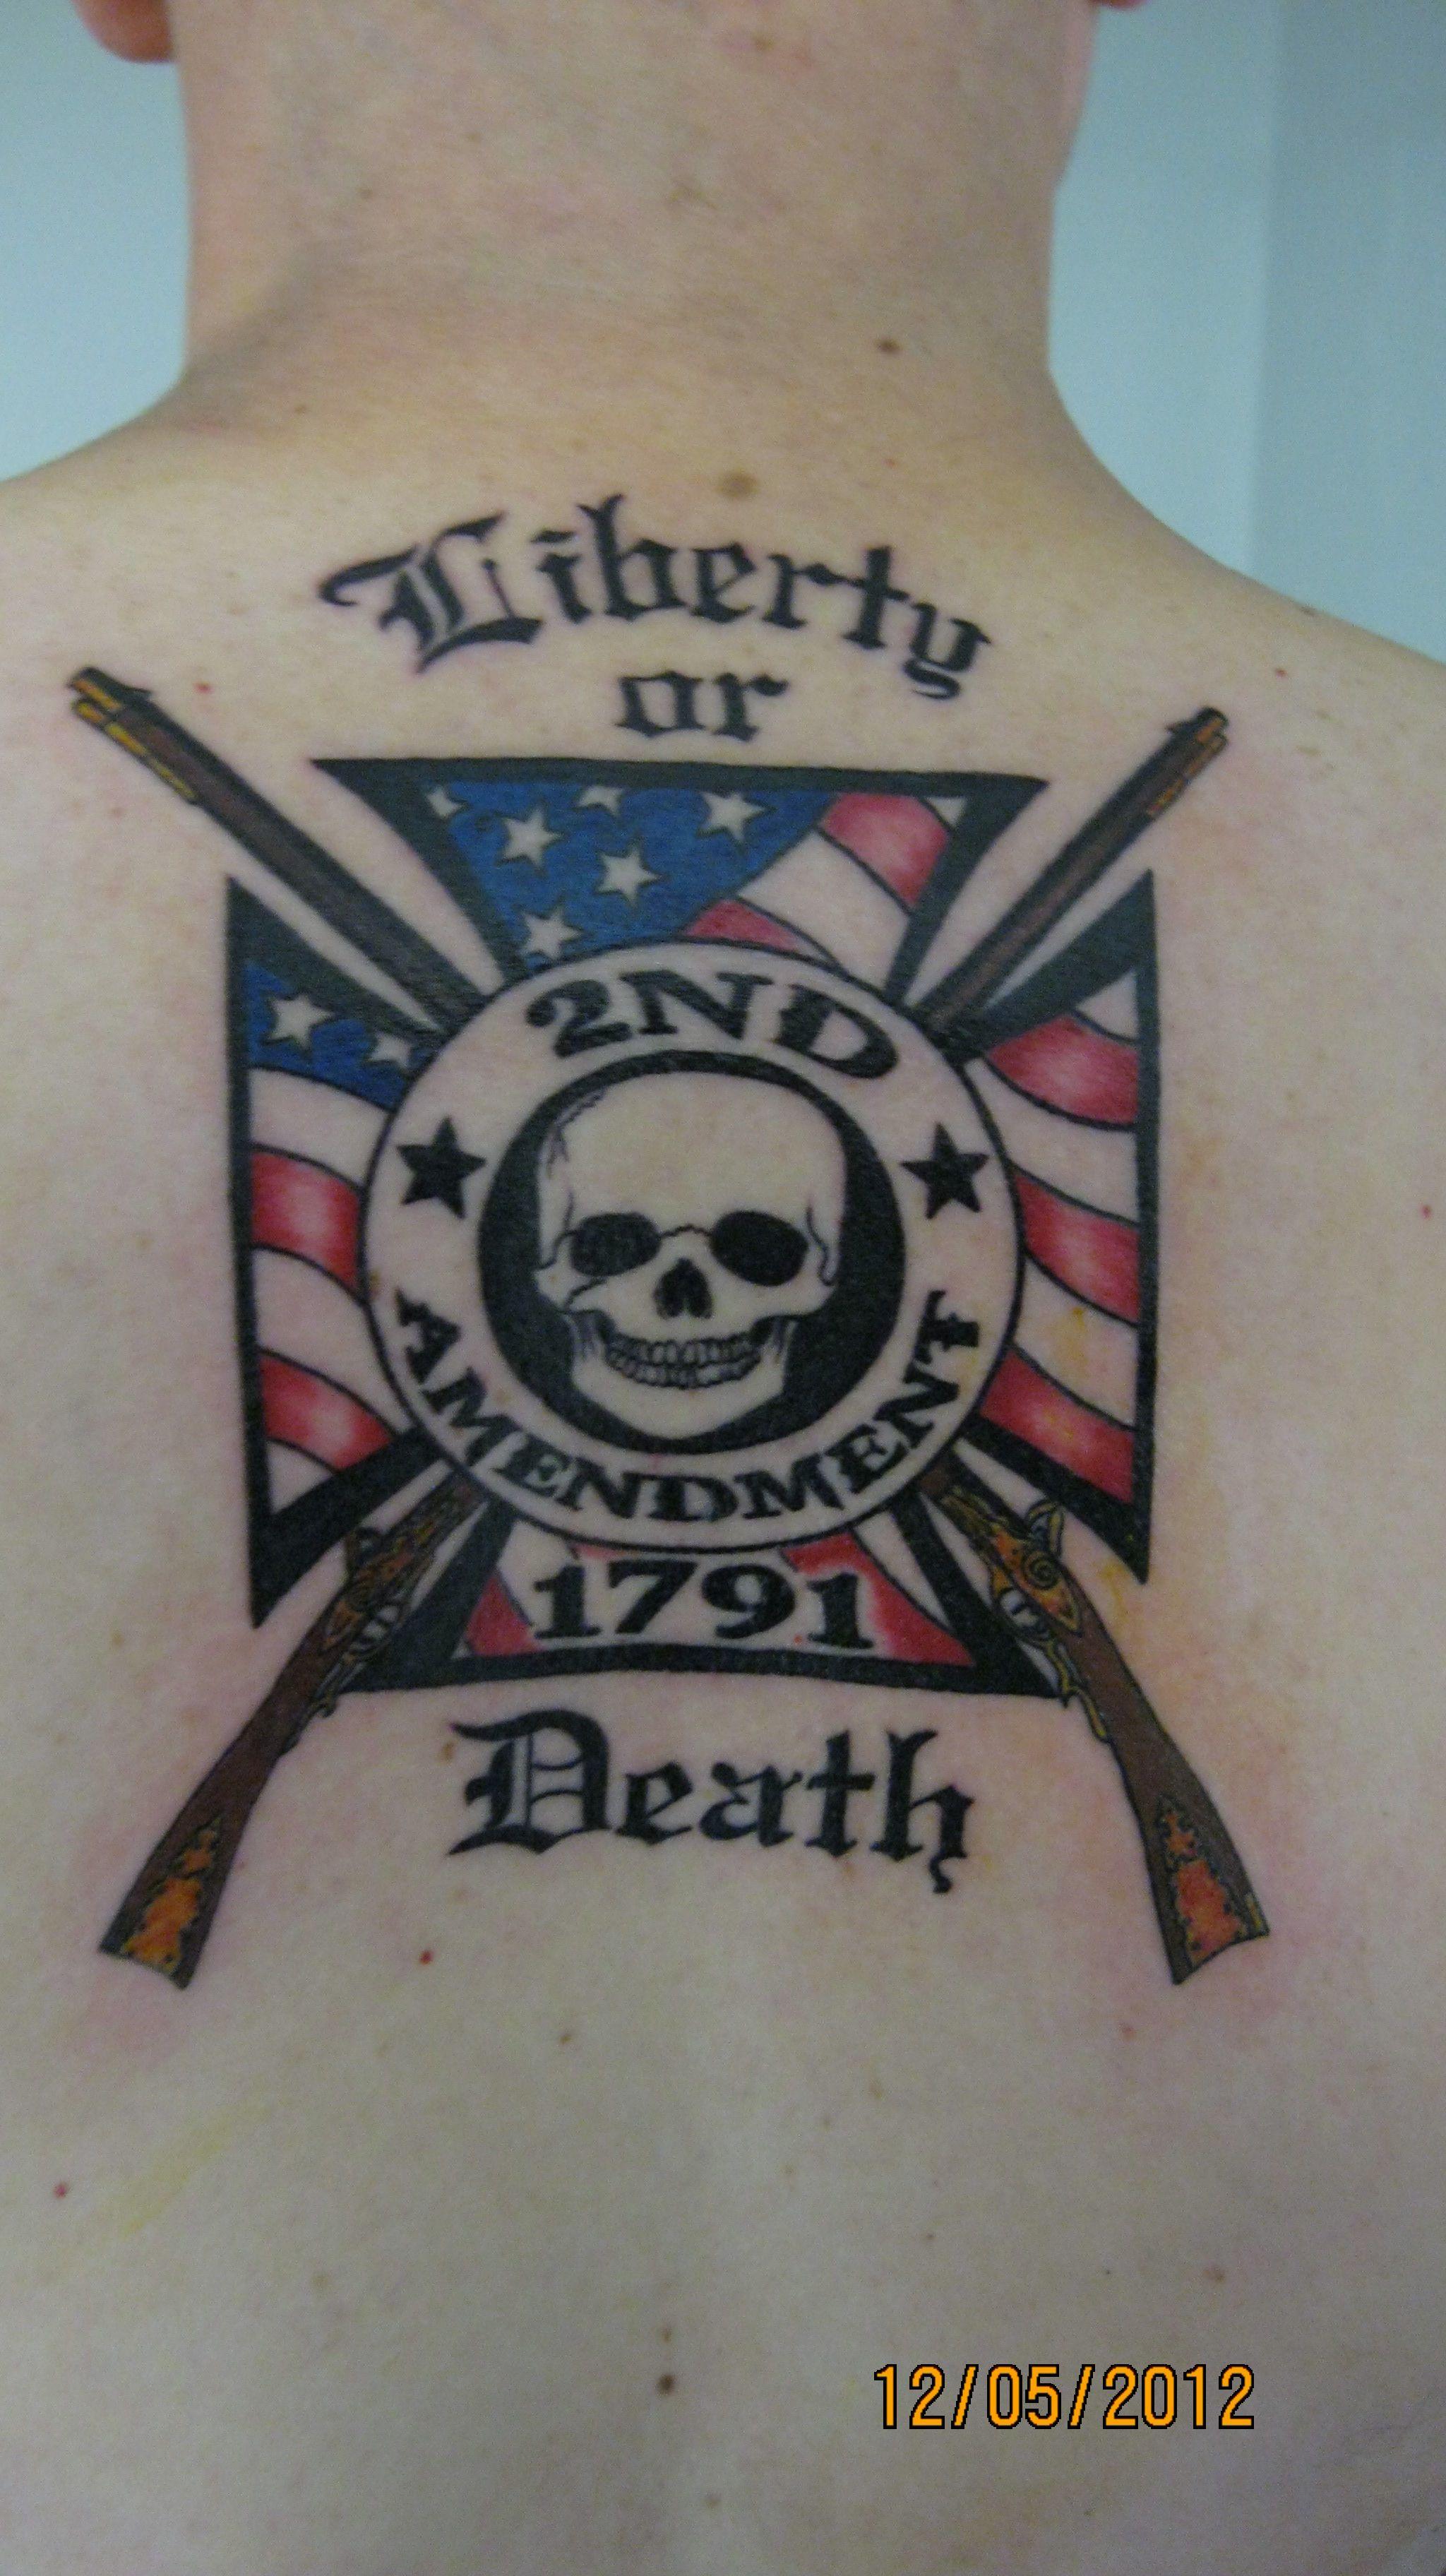 Bye don stevens baton rouge la sick tattoo baton rouge